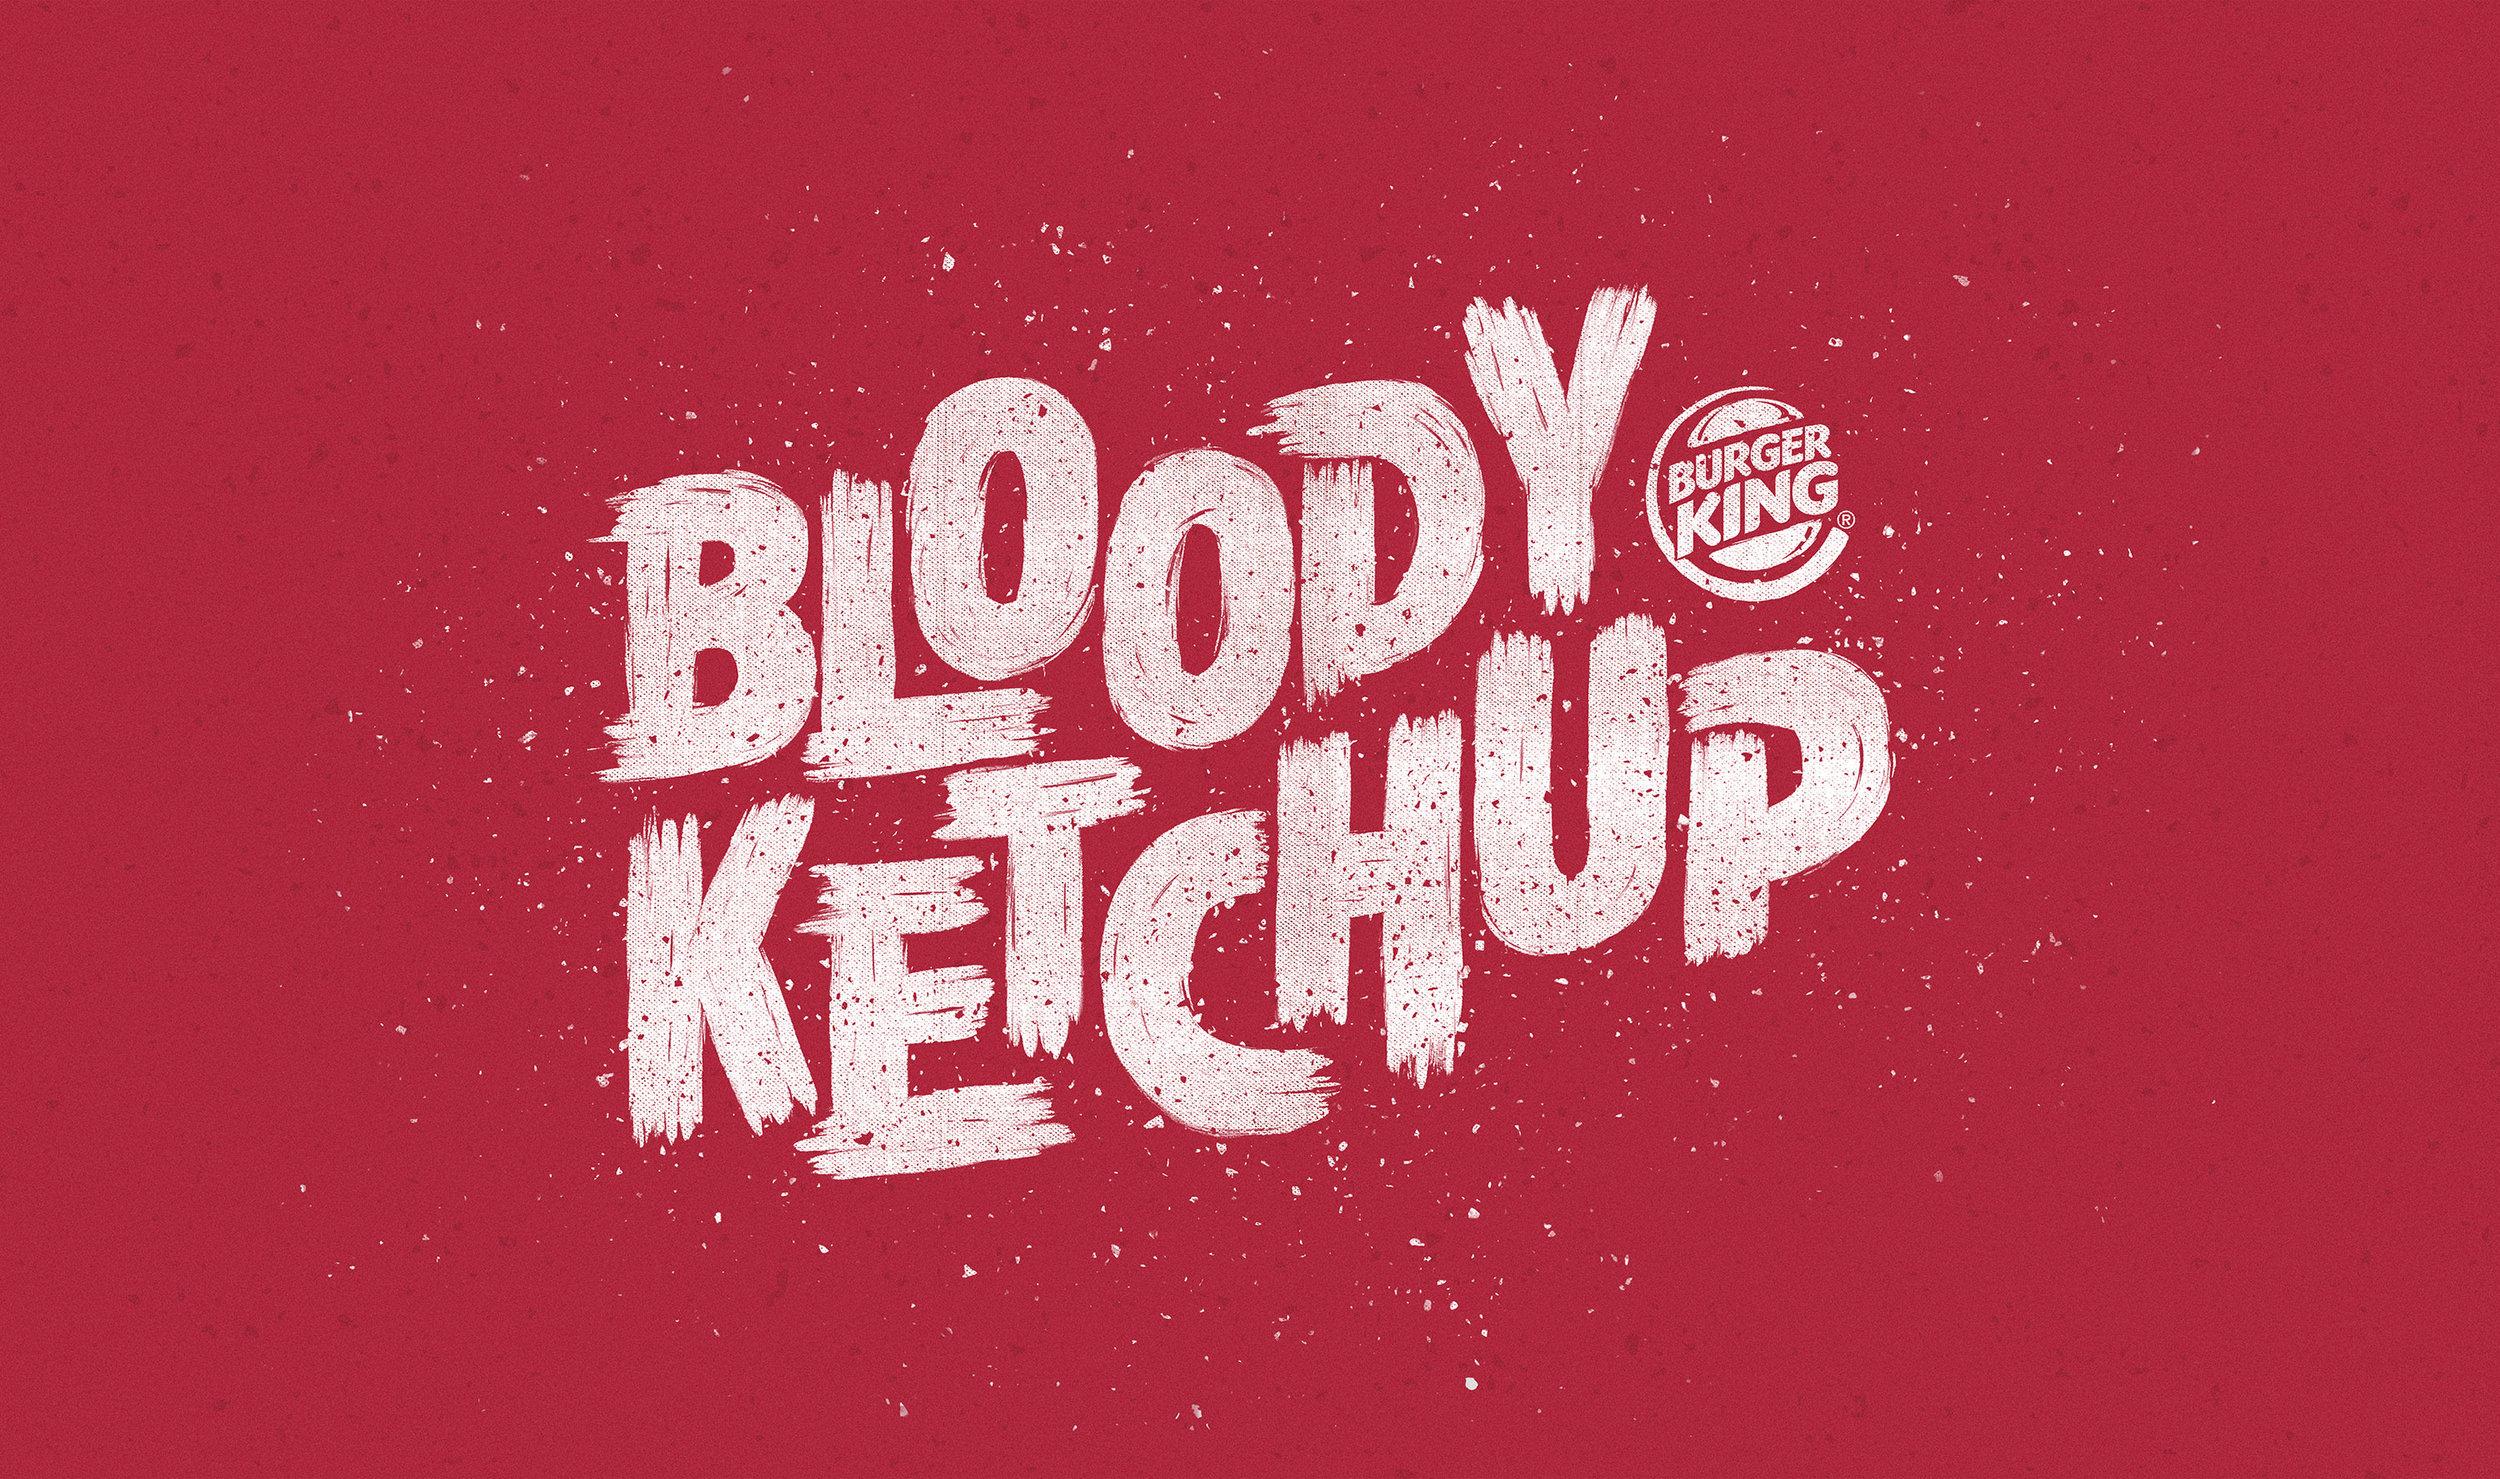 bk-bloodyketchups-7.jpg